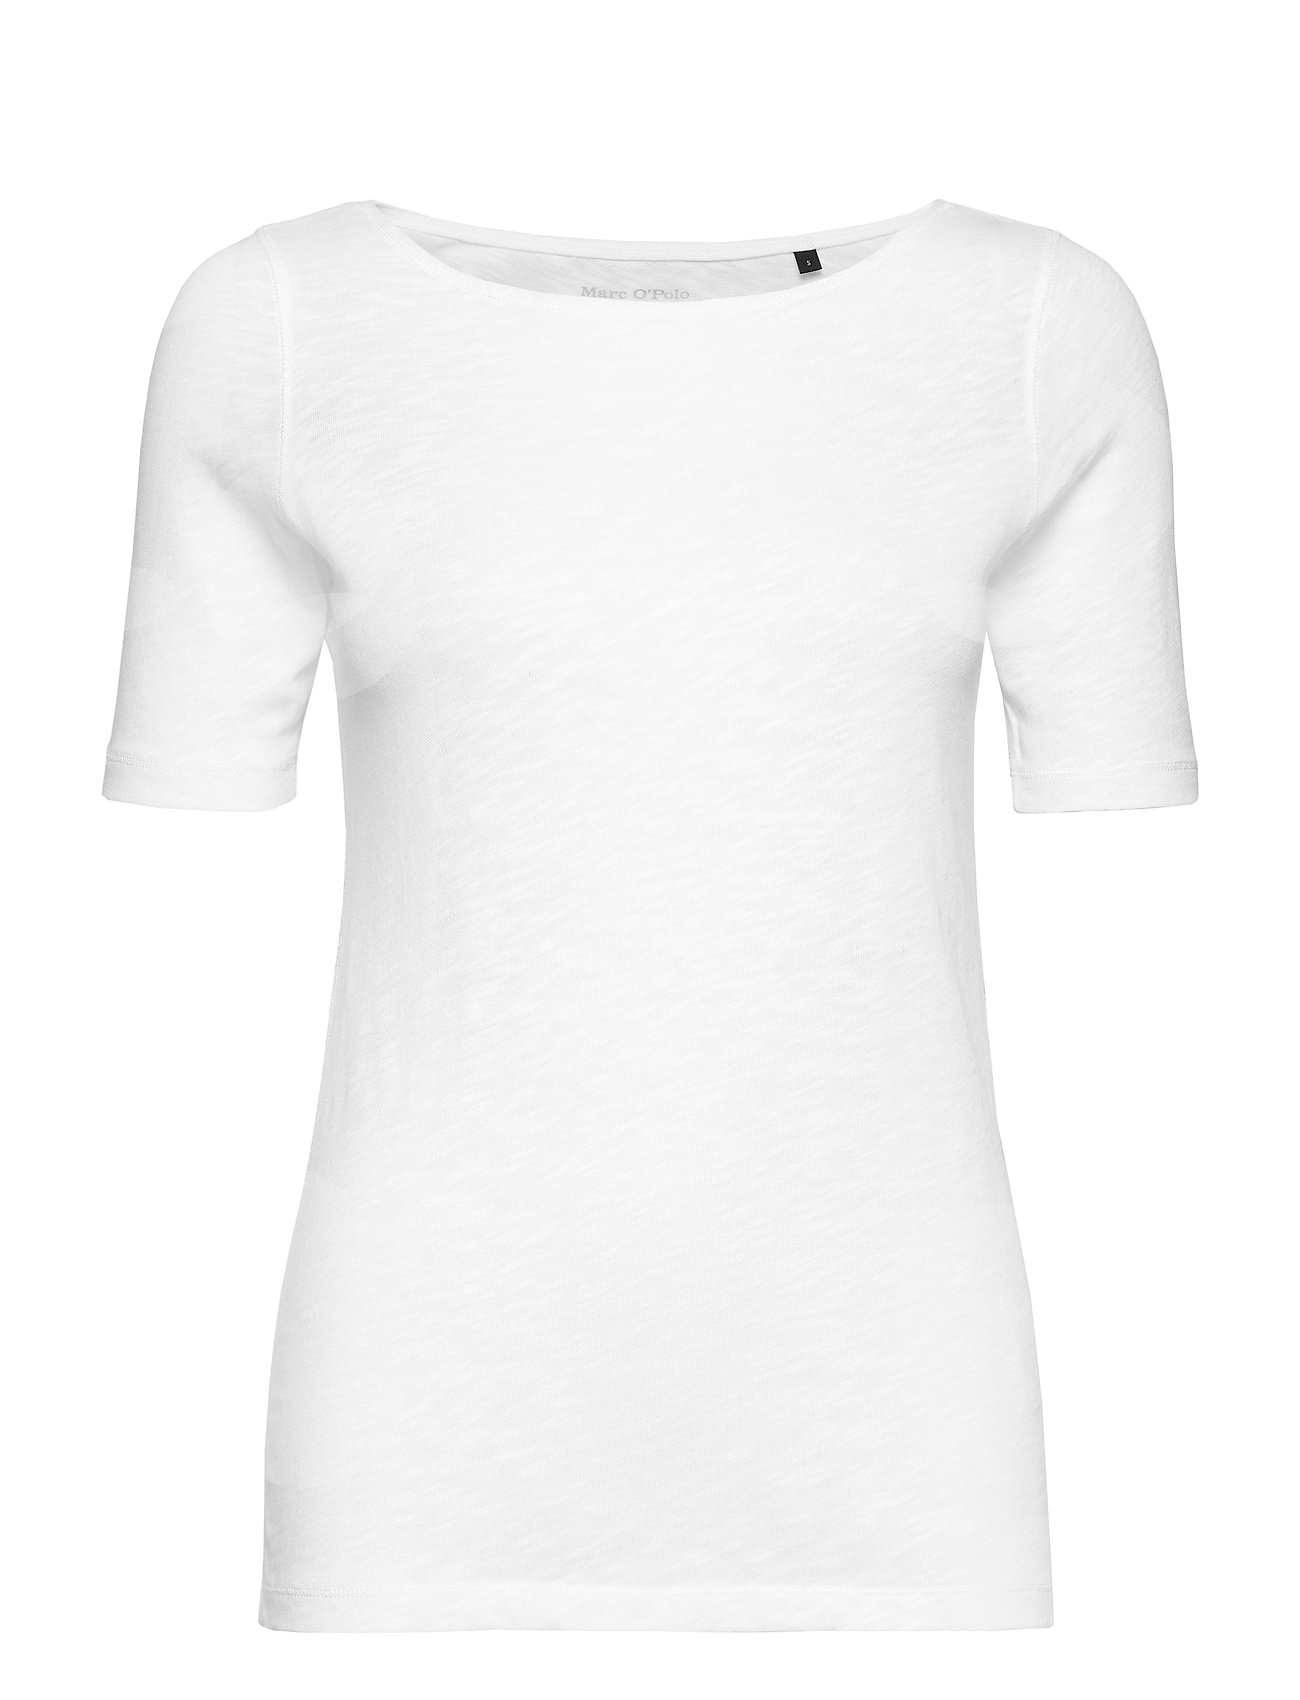 O'polo T SleevewhiteMarc T Short shirt SleevewhiteMarc shirt Short RL5Aj4